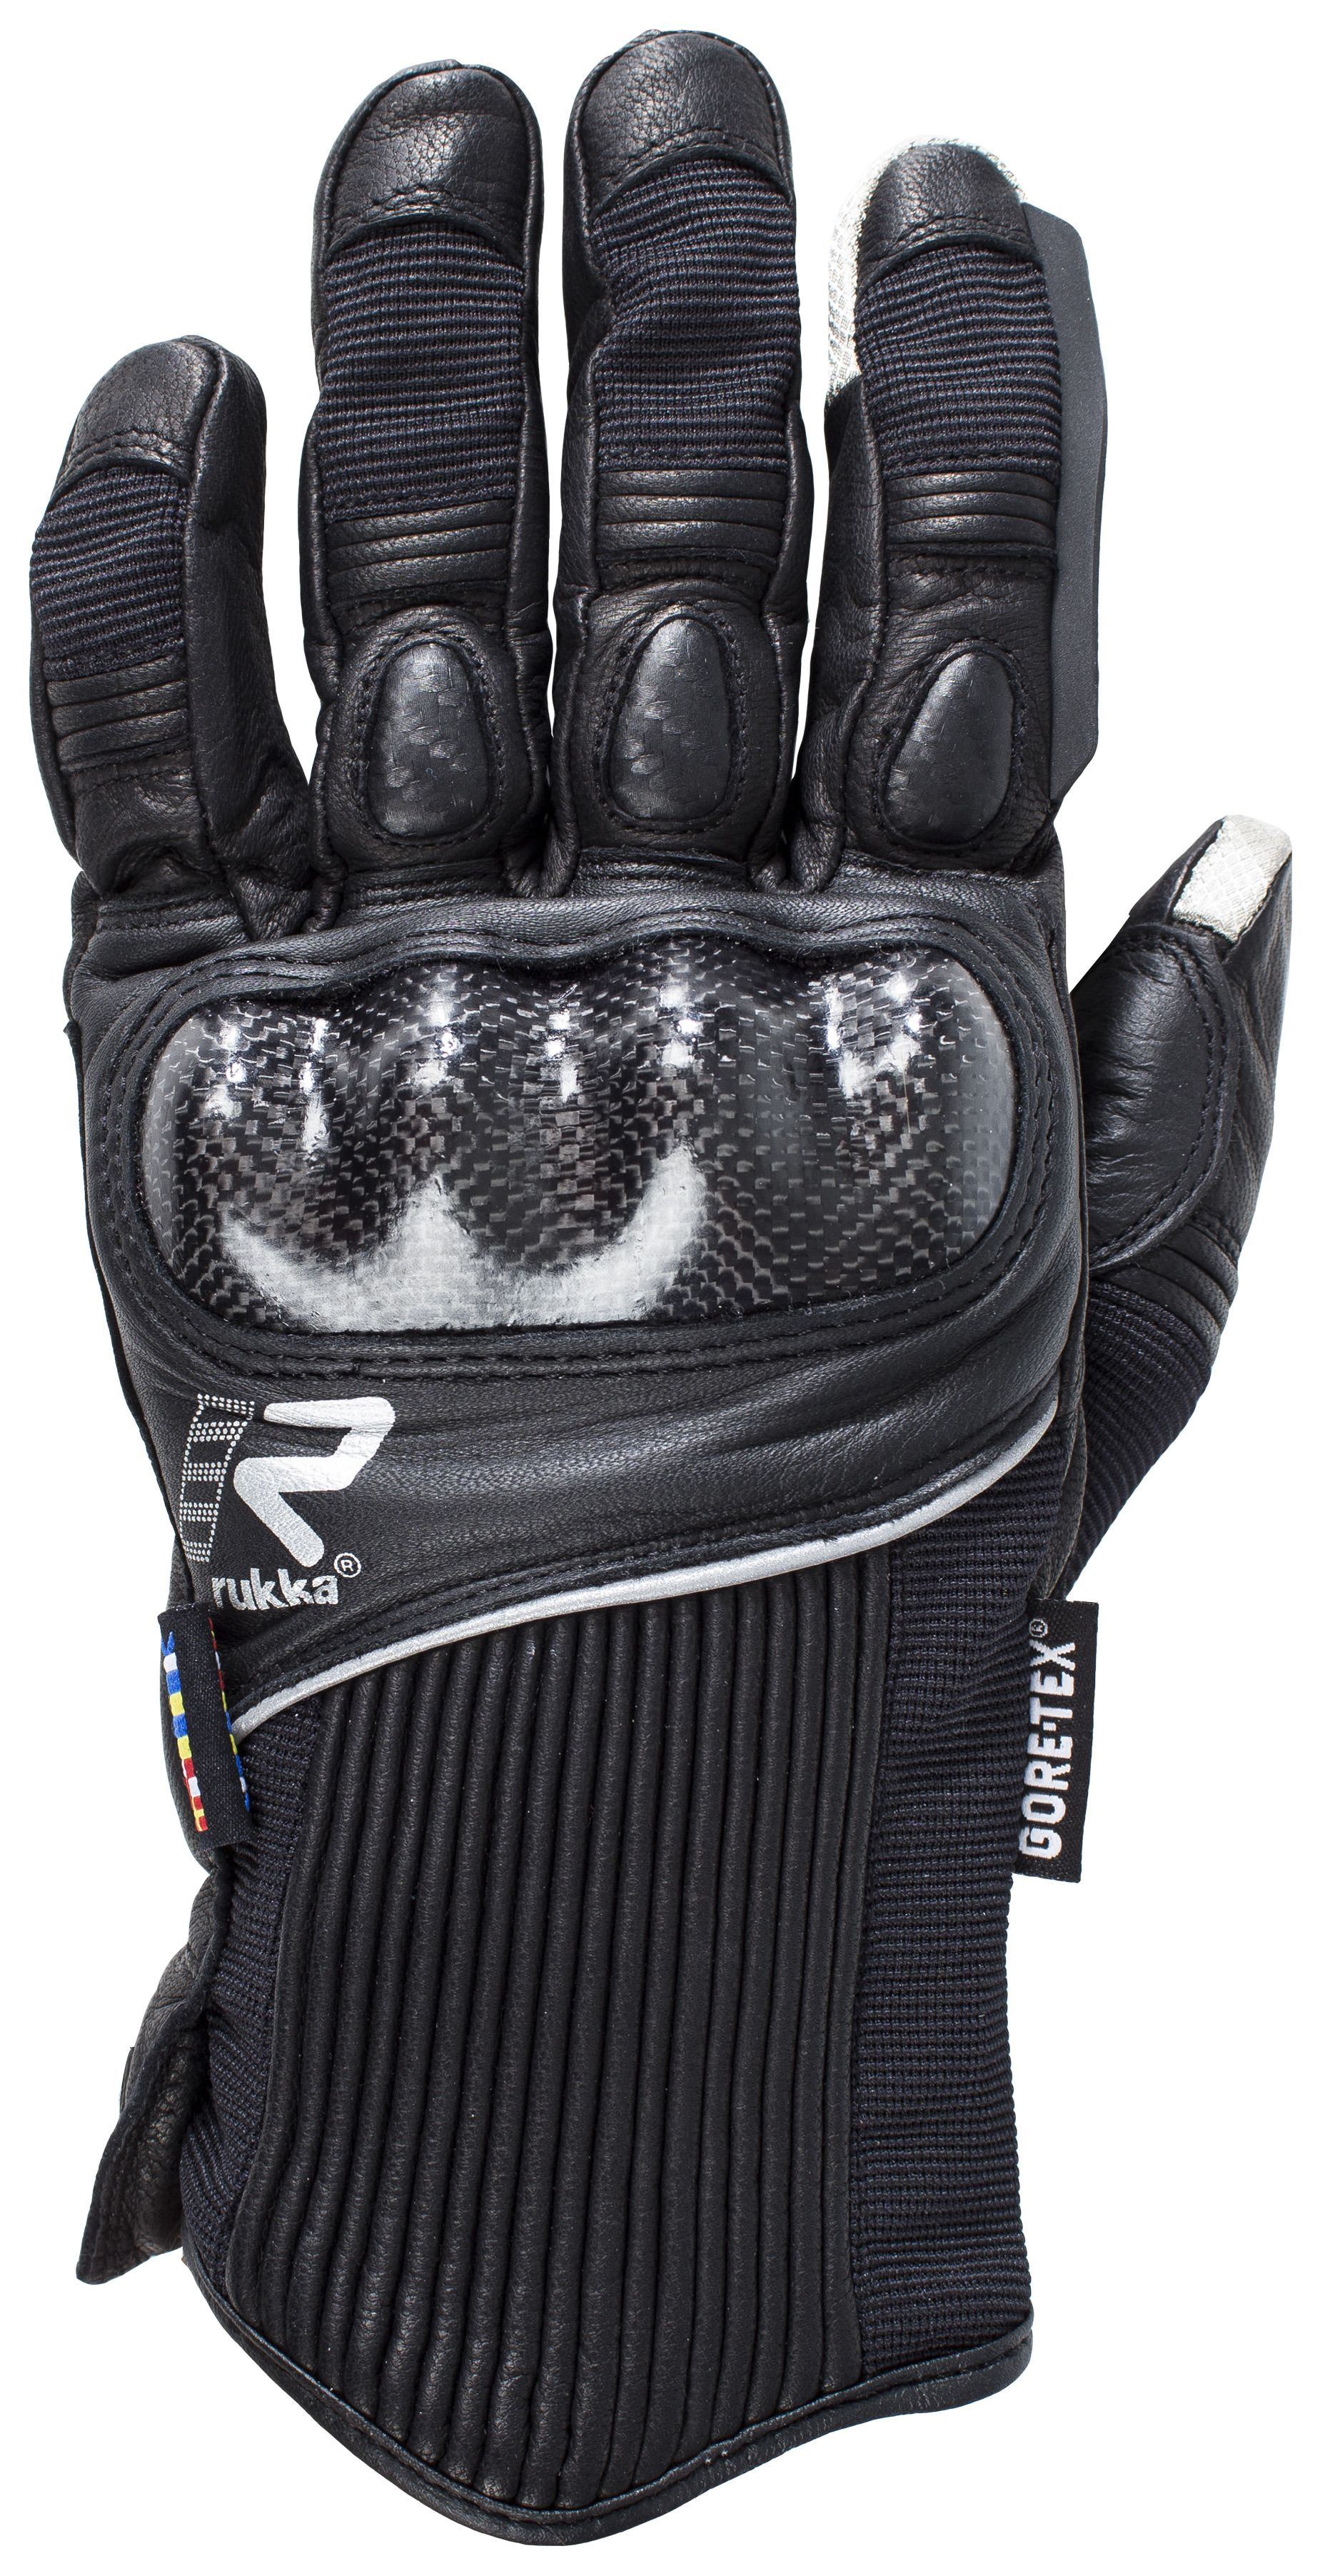 Motorcycle gloves ottawa - Motorcycle Gloves Ottawa 56